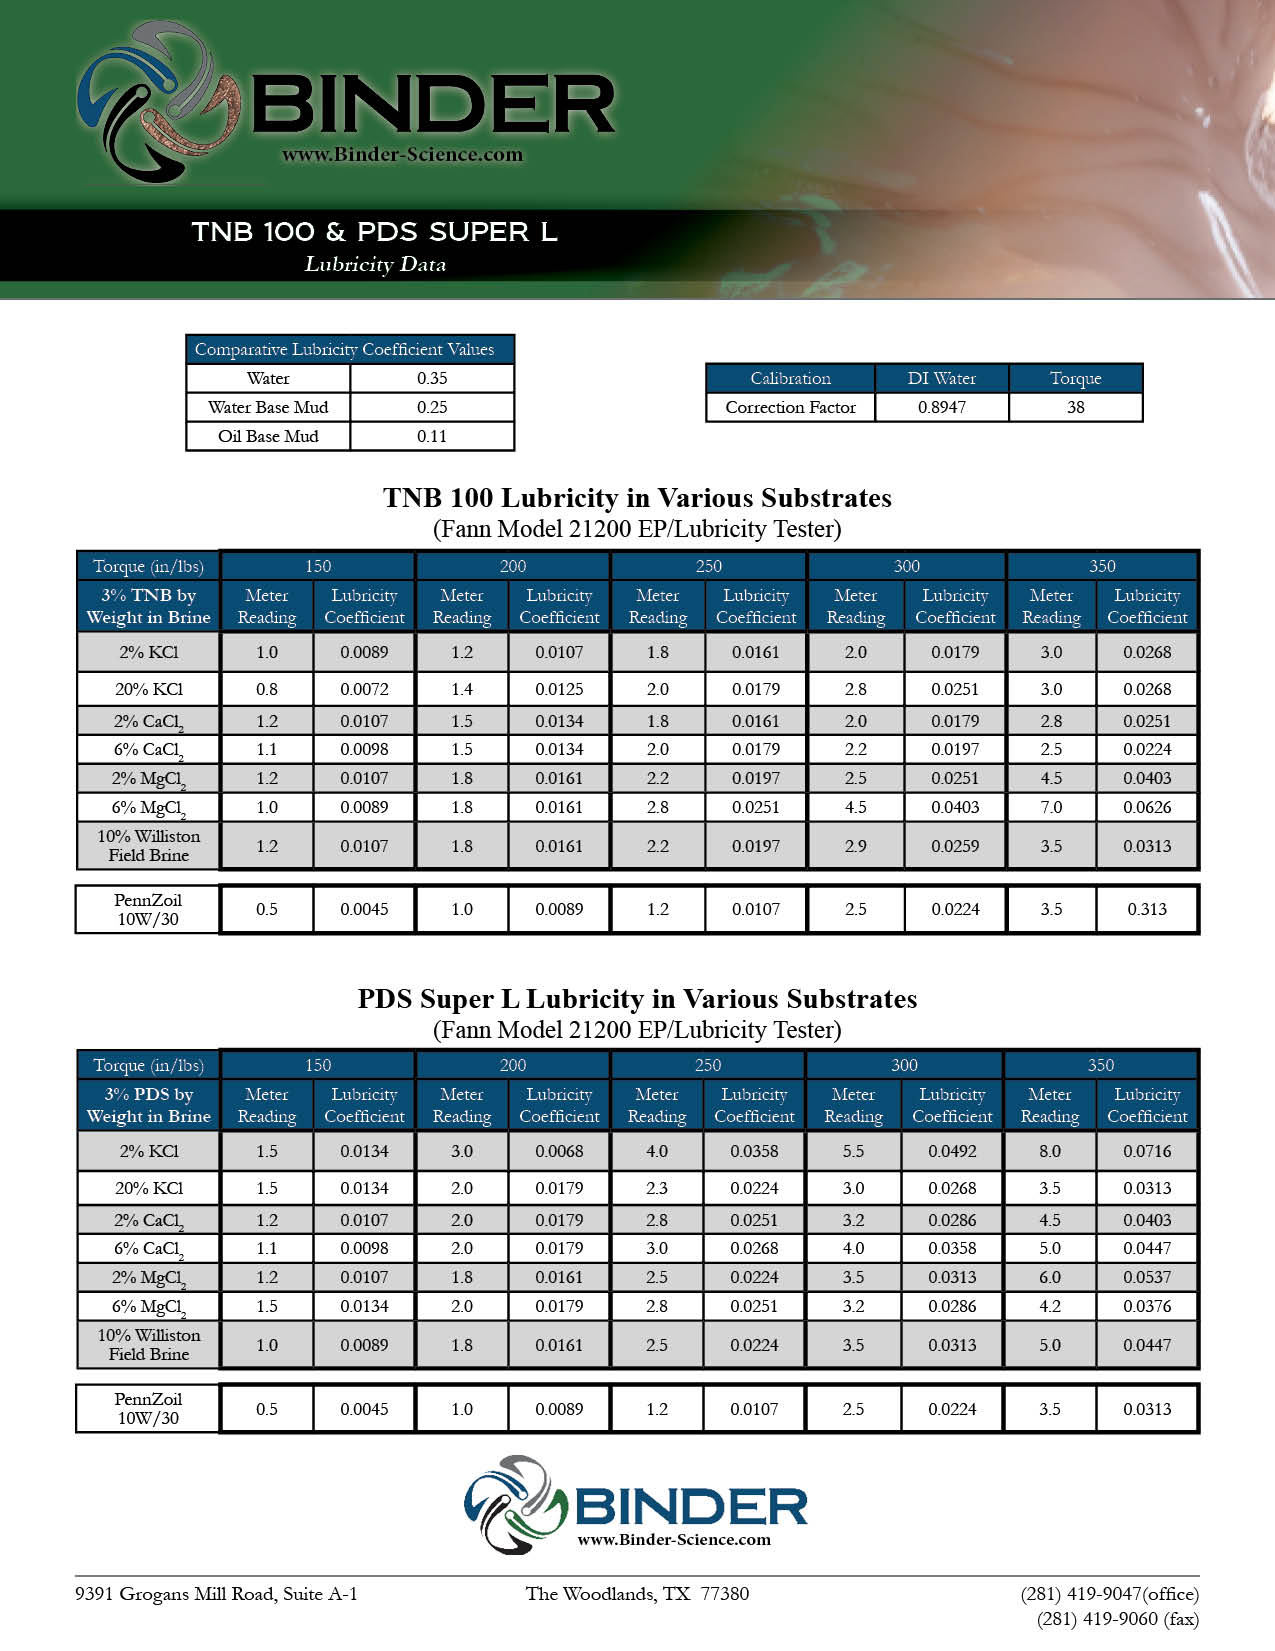 PDS Super L & TNB 100Data